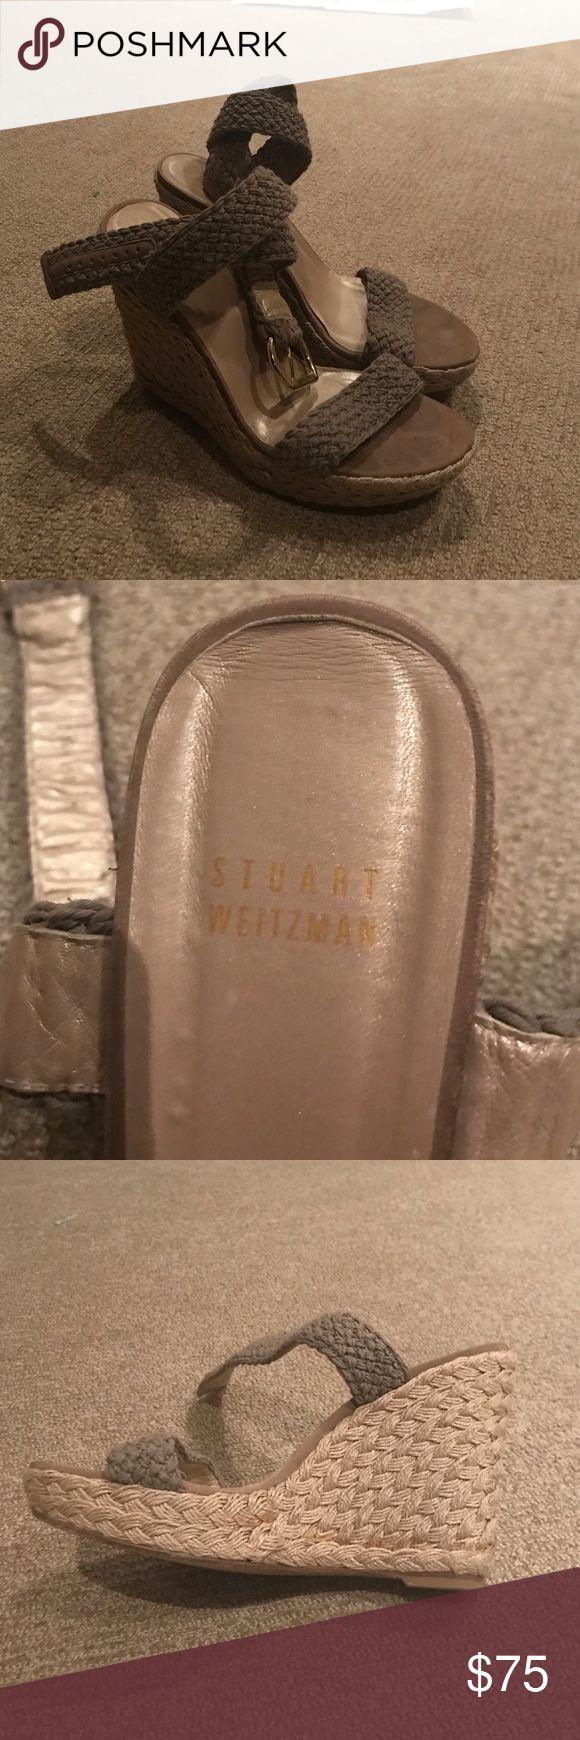 Stuart Weitzman Espadrilles Beige and Gold Stuart Weitzman Espadrilles Stuart Weitzman Shoes Espadrilles